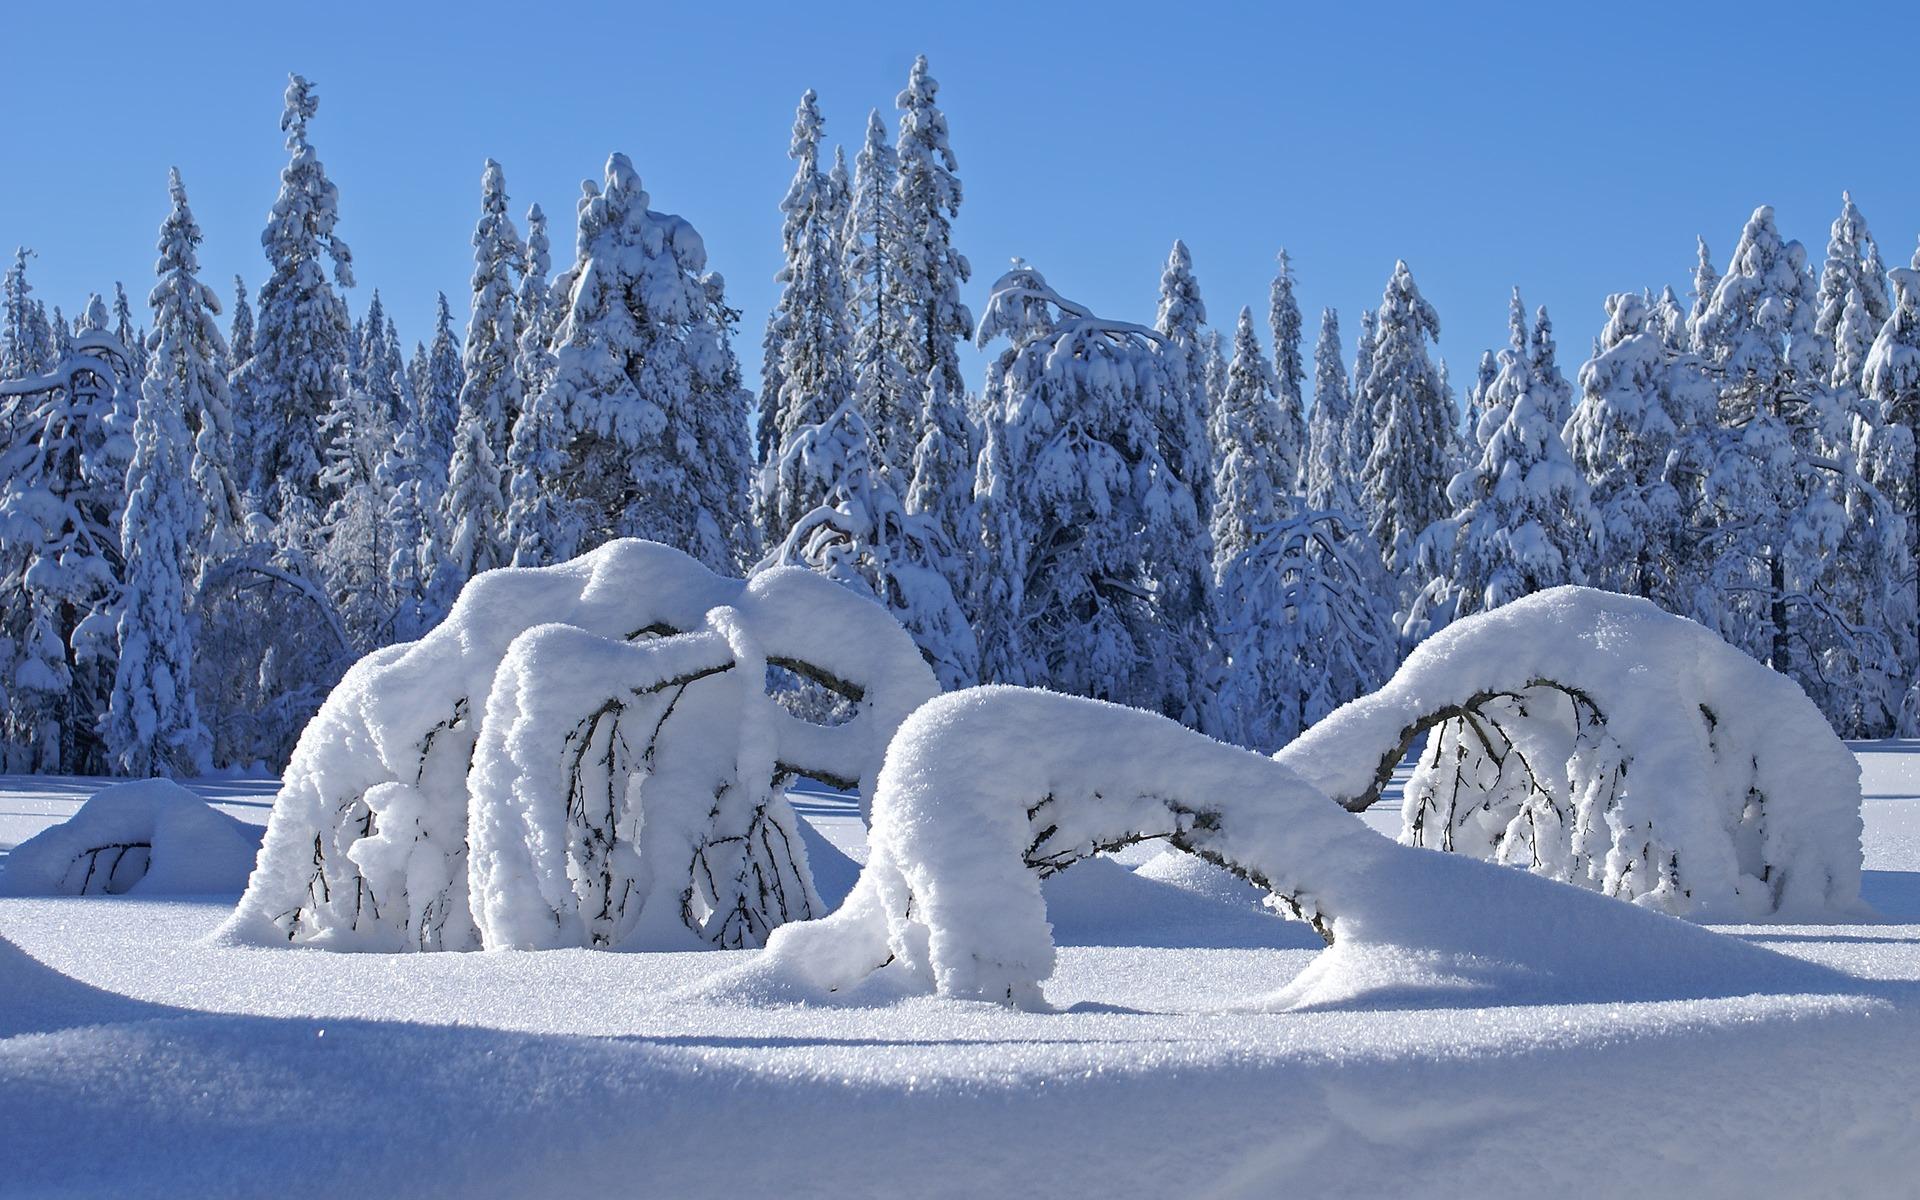 snow winter seasons sea - photo #33